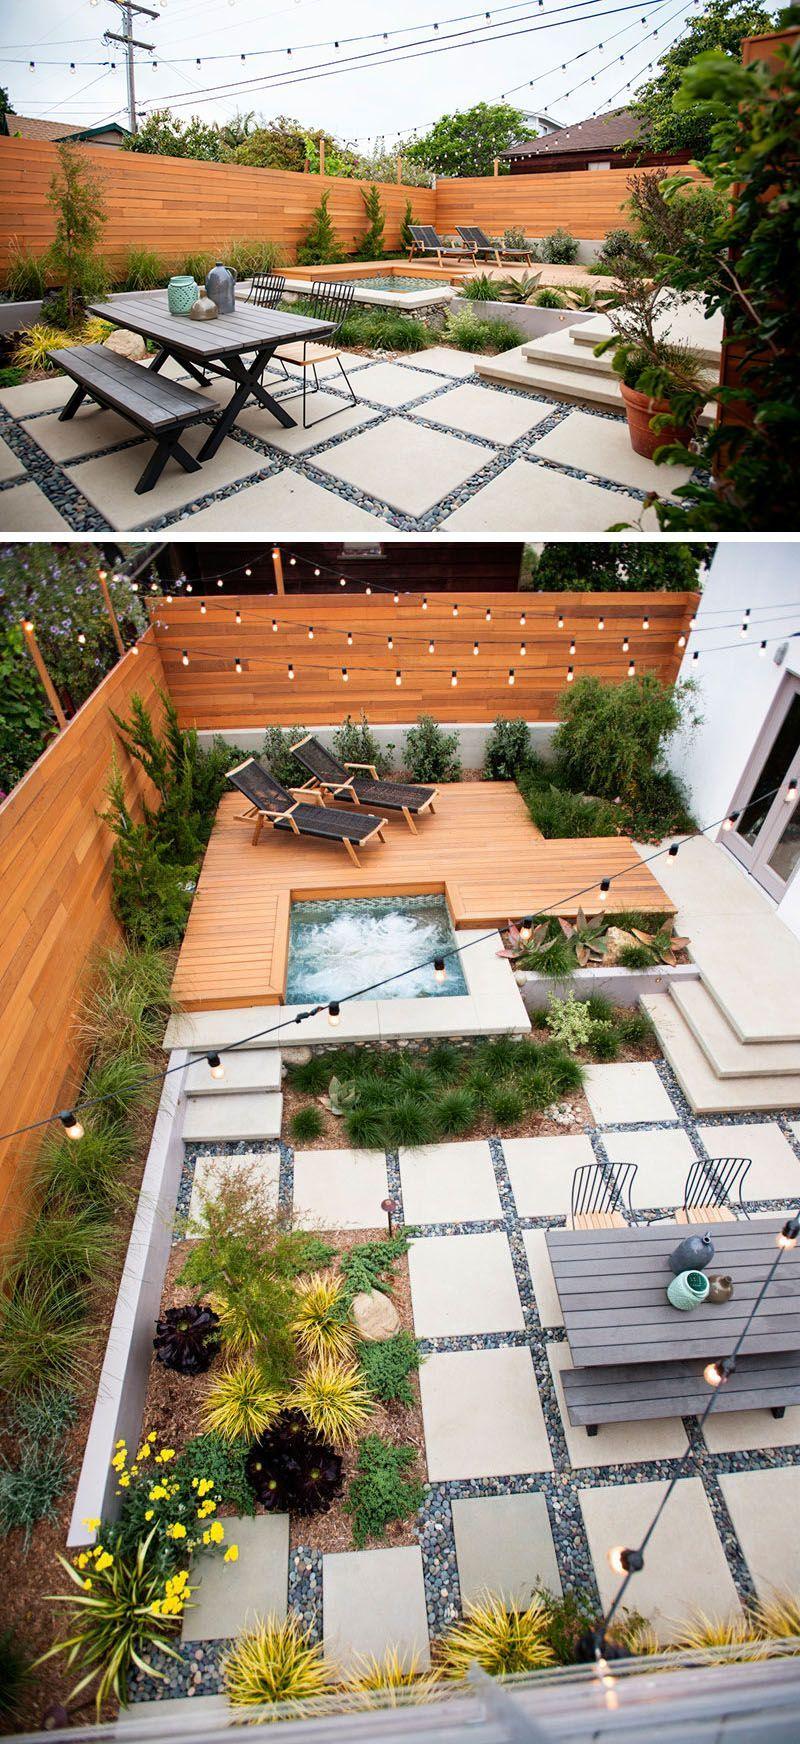 Landscaping Design Ideas – 11 Backyards Designed For Entertaining